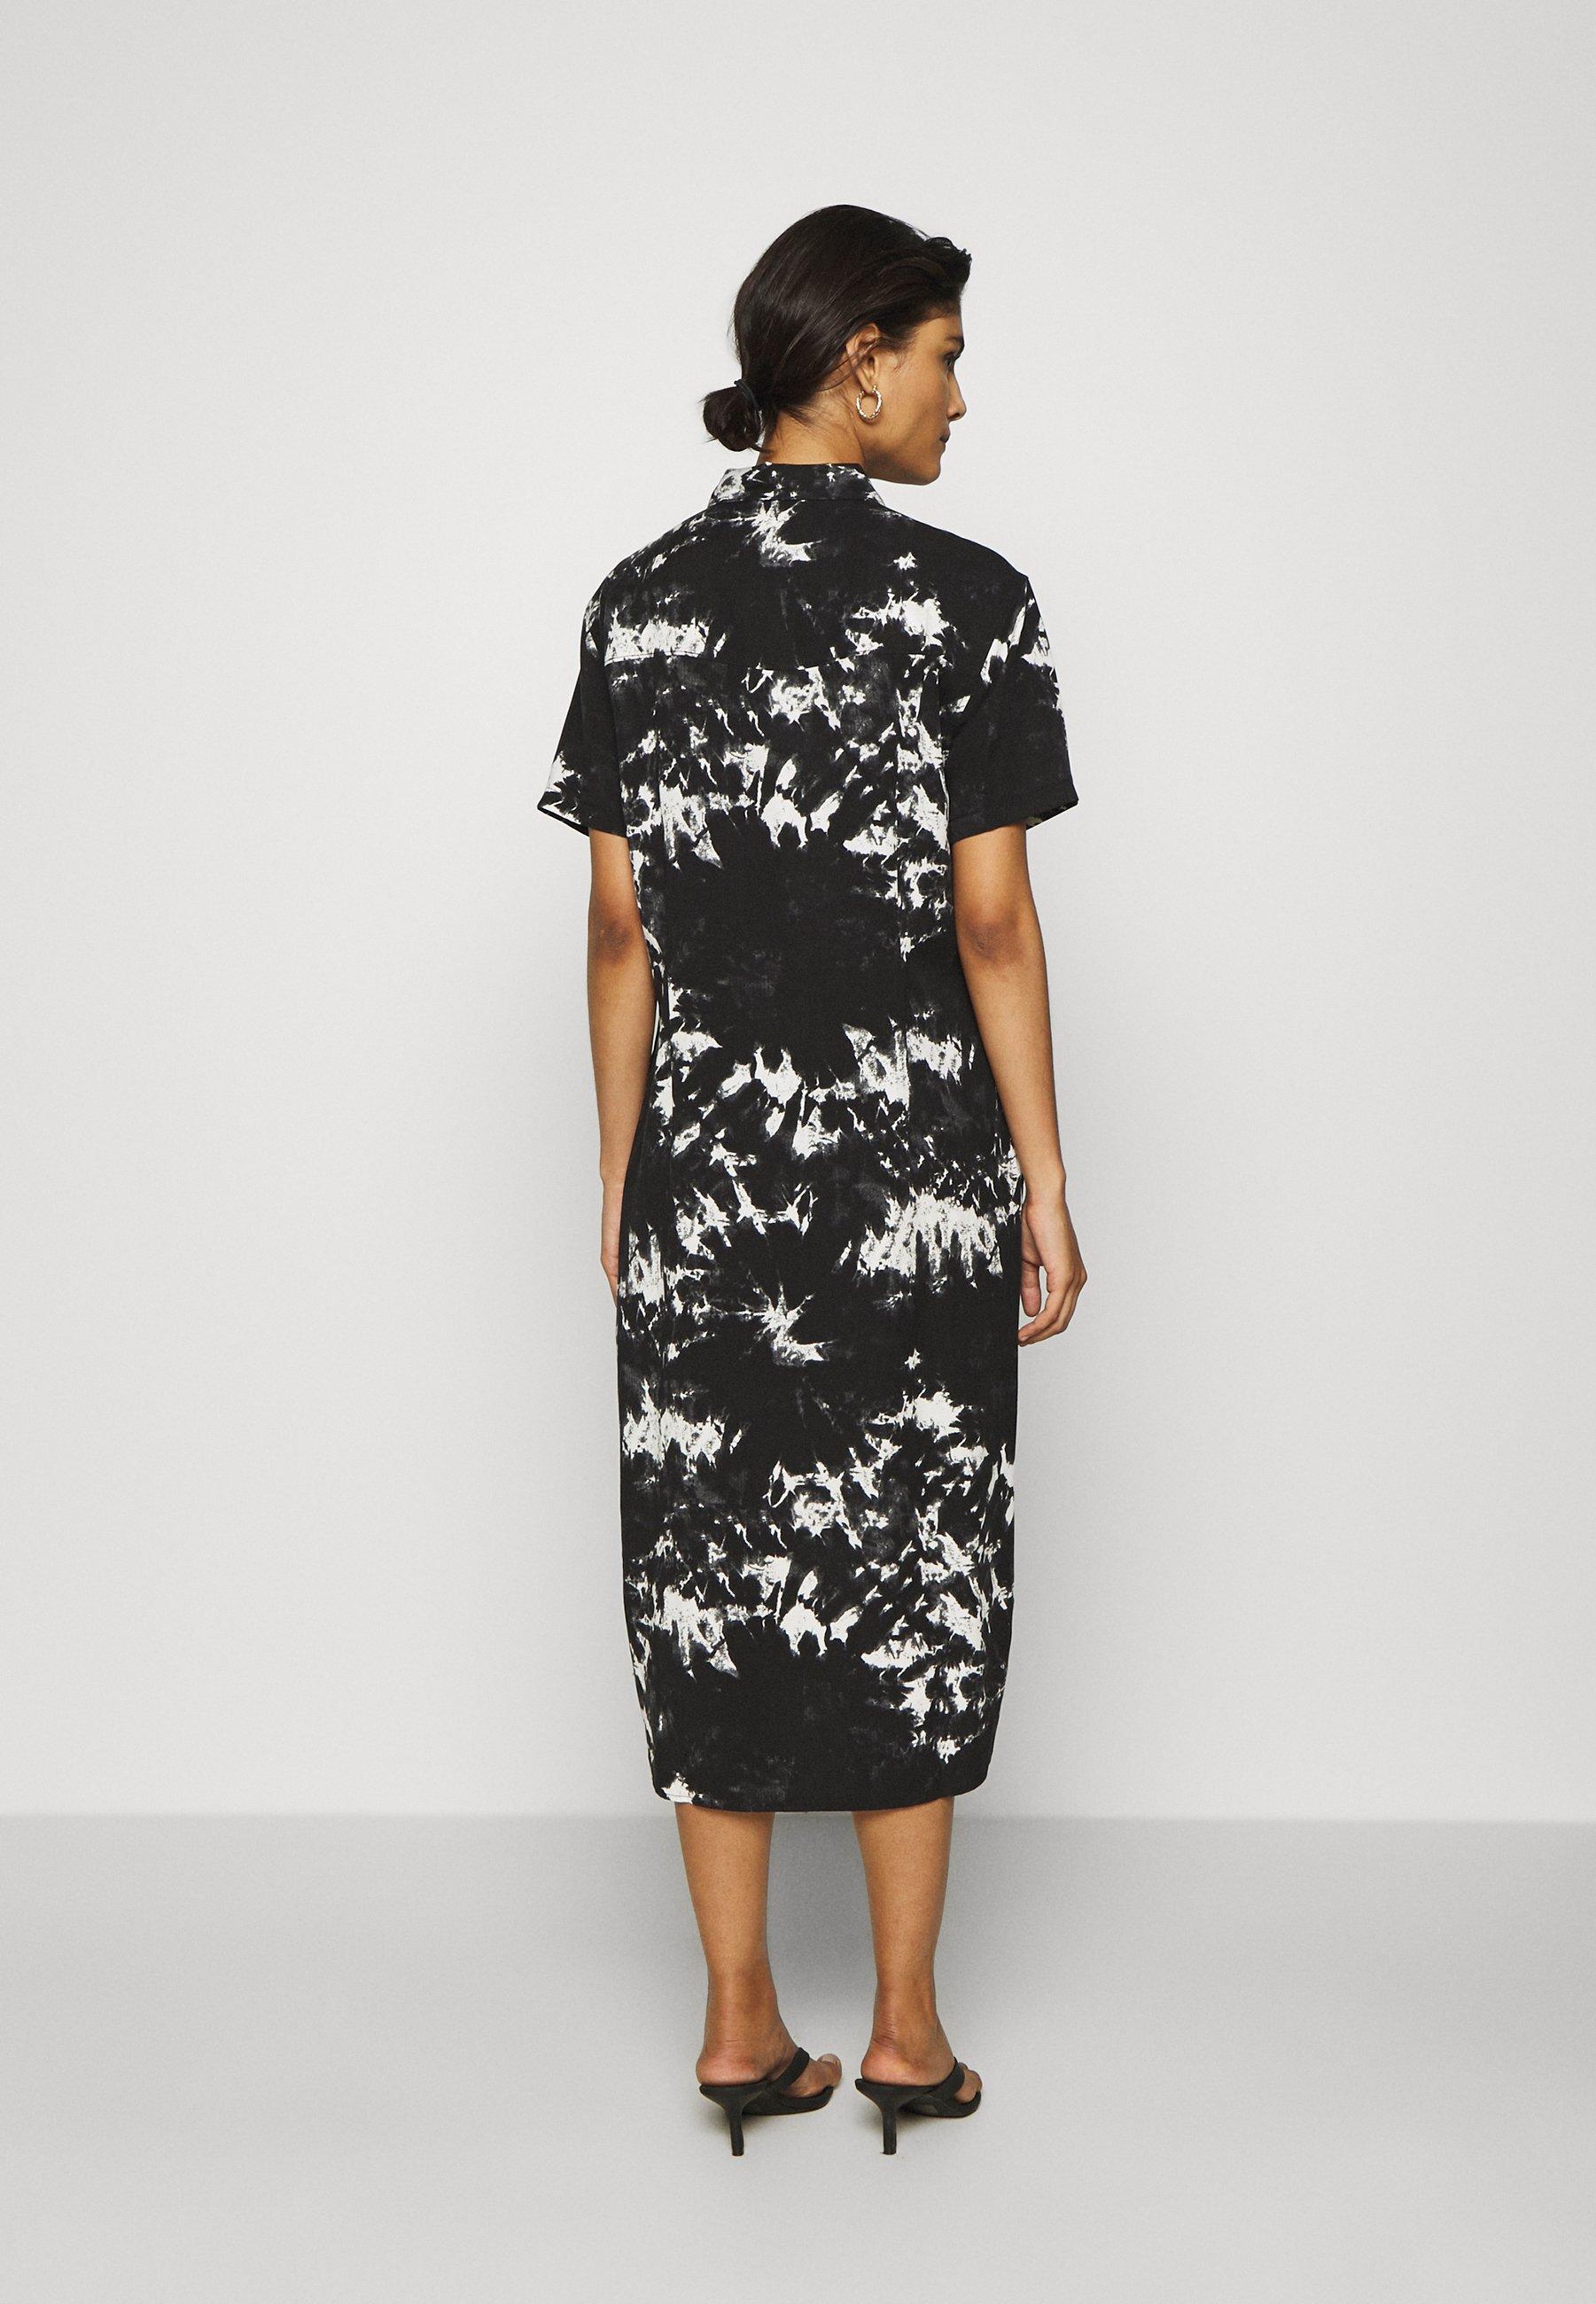 Limit Discount Women's Clothing Tiger of Sweden Jeans CADITTE Maxi dress black lVHXmt5I2